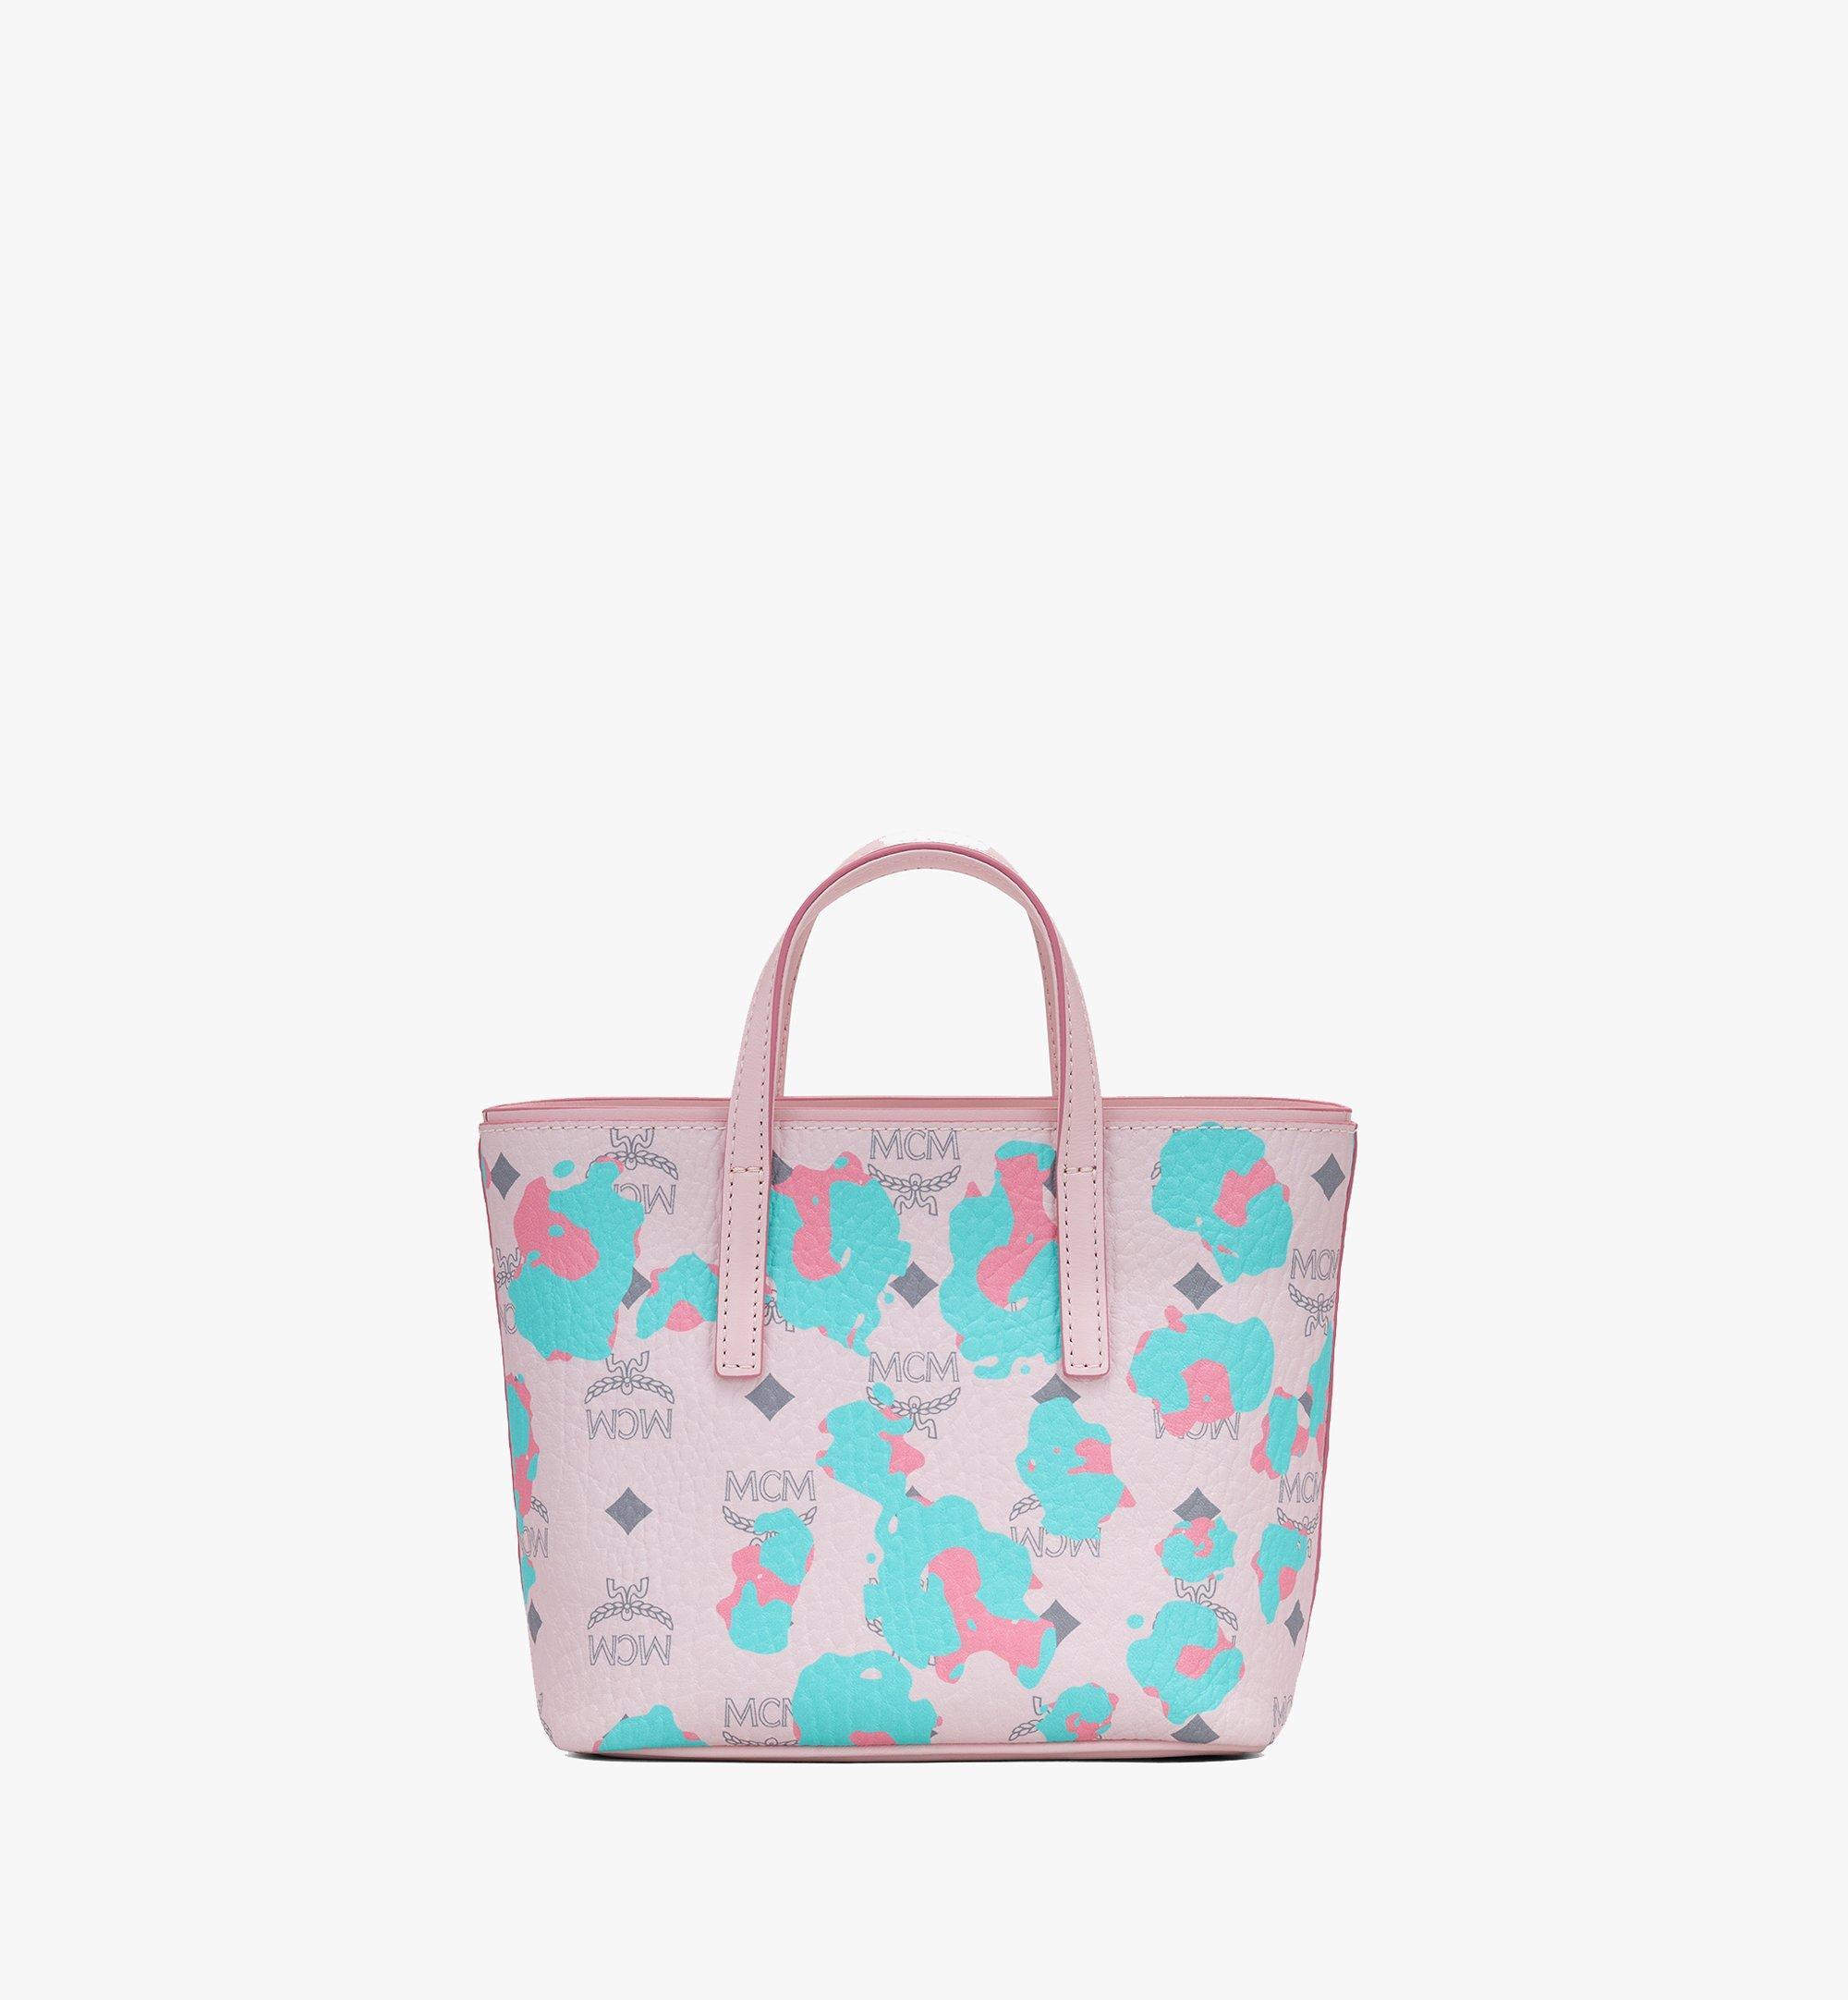 MCM Anya Shopper in Floral Leopard Pink MWPASVI04QI001 Alternate View 3